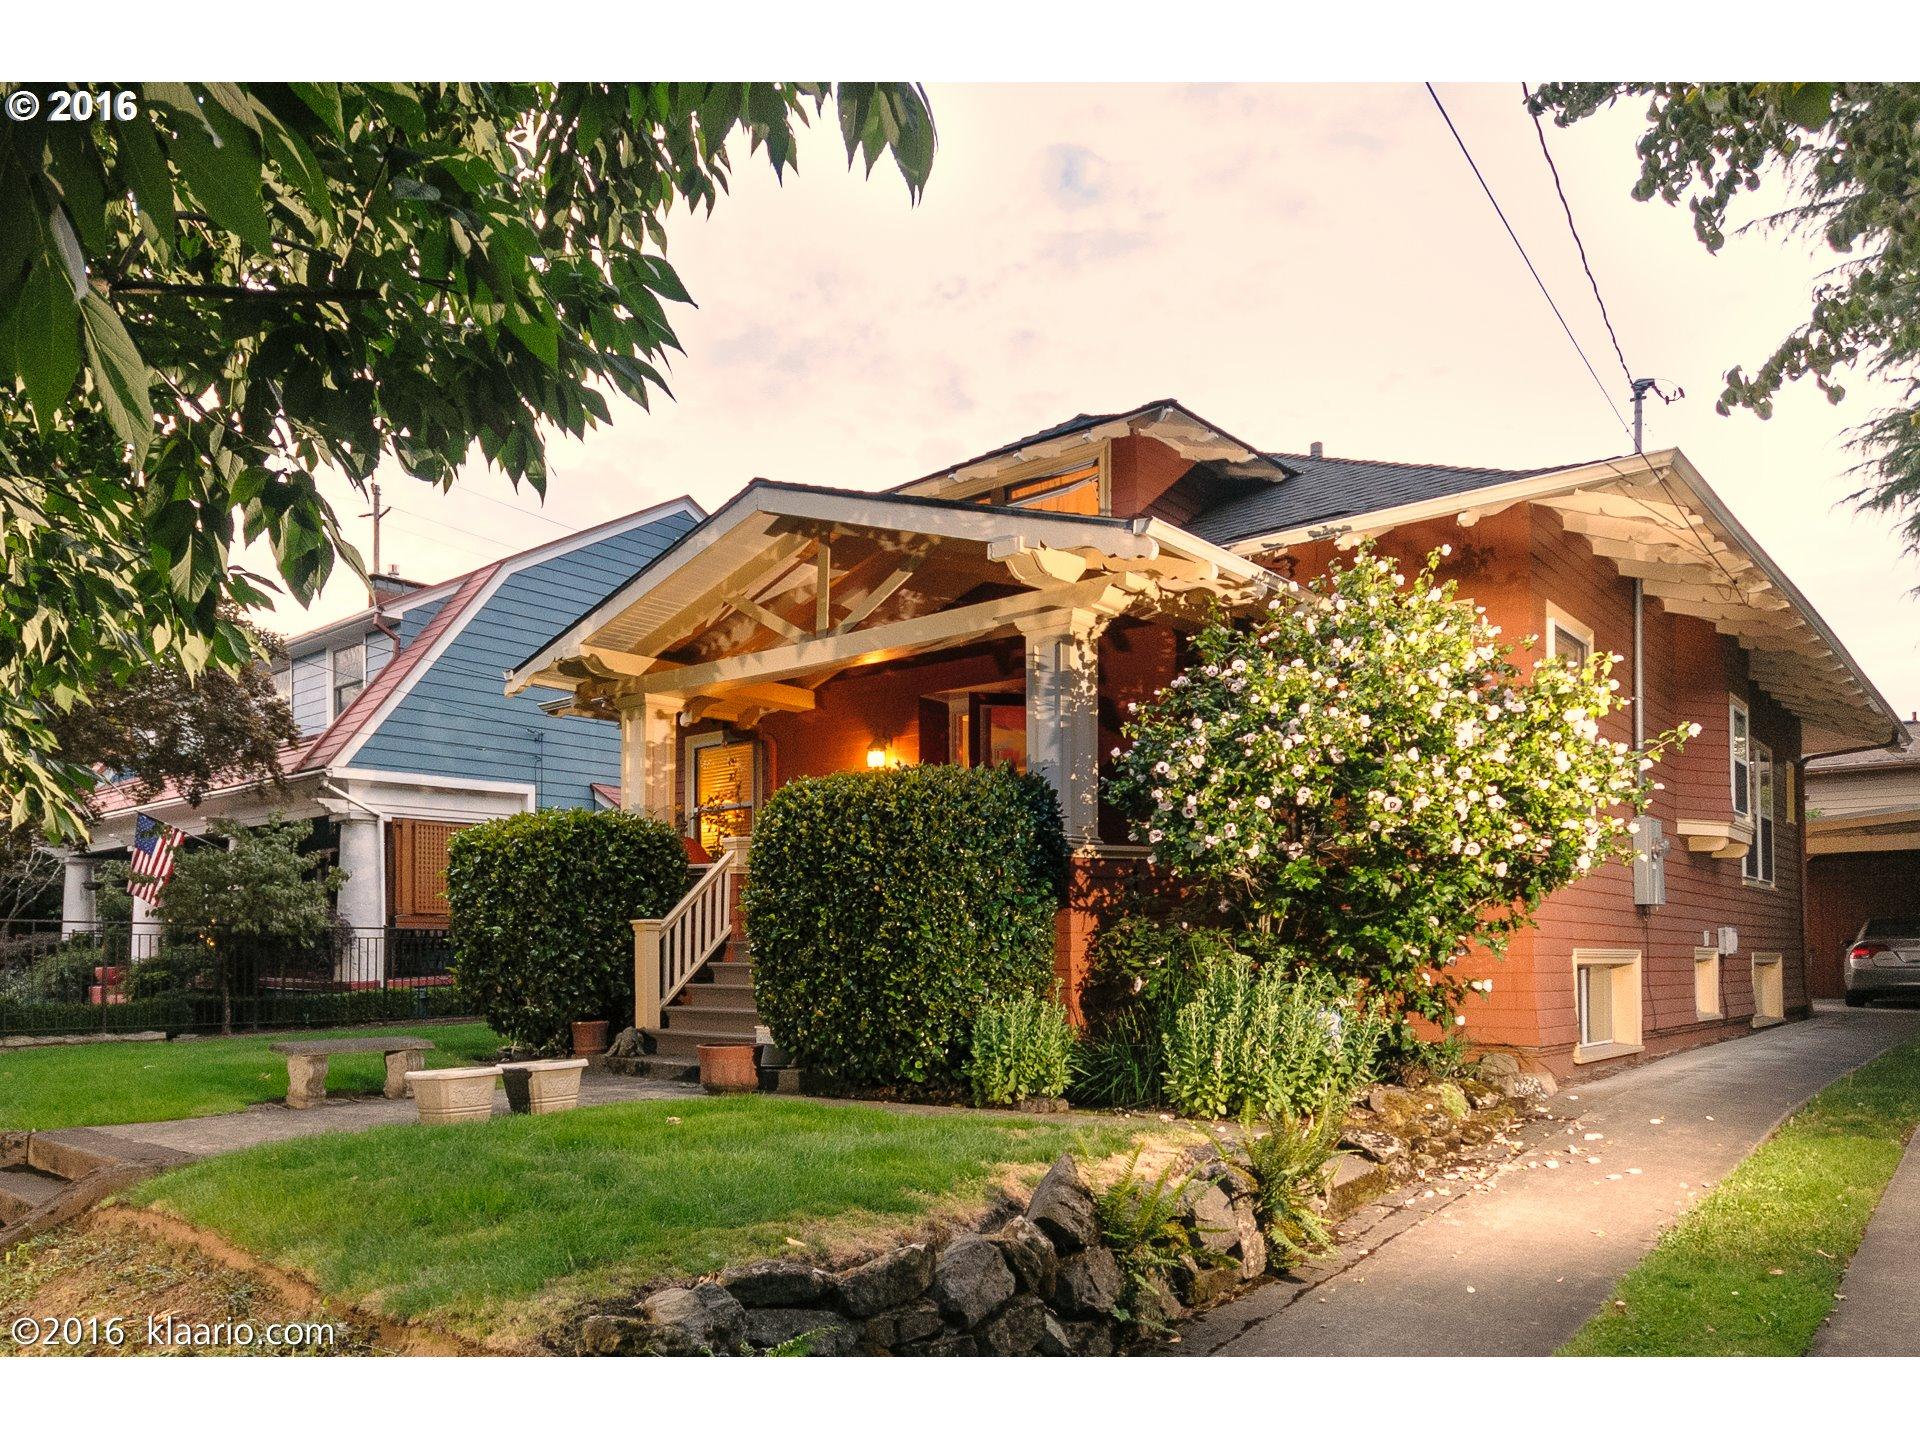 Property for sale at 2219 NE Clackamas ST, Portland,  OR 97232